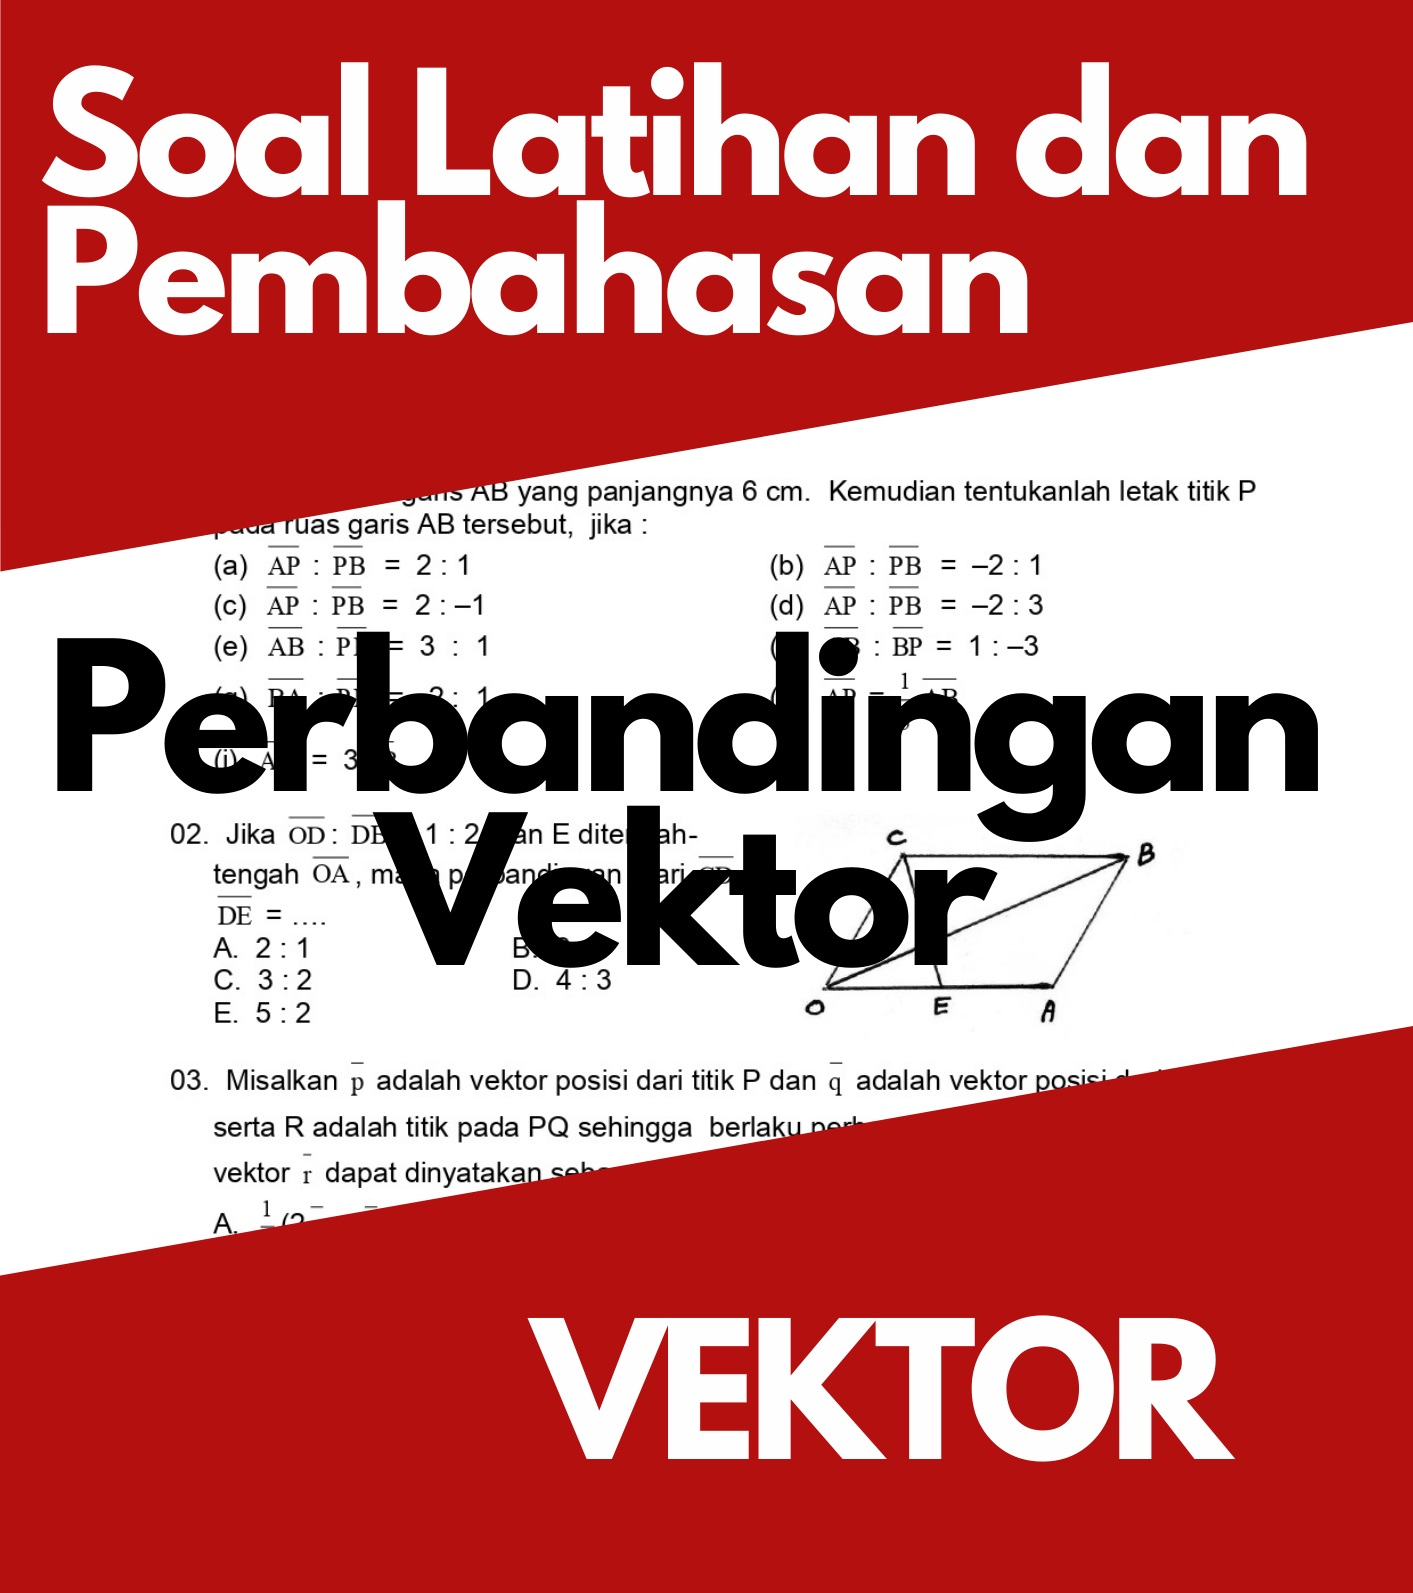 Matematika Dasar SMA: Soal Latihan dan Pembahasan Tinjauan Analitis Vektor